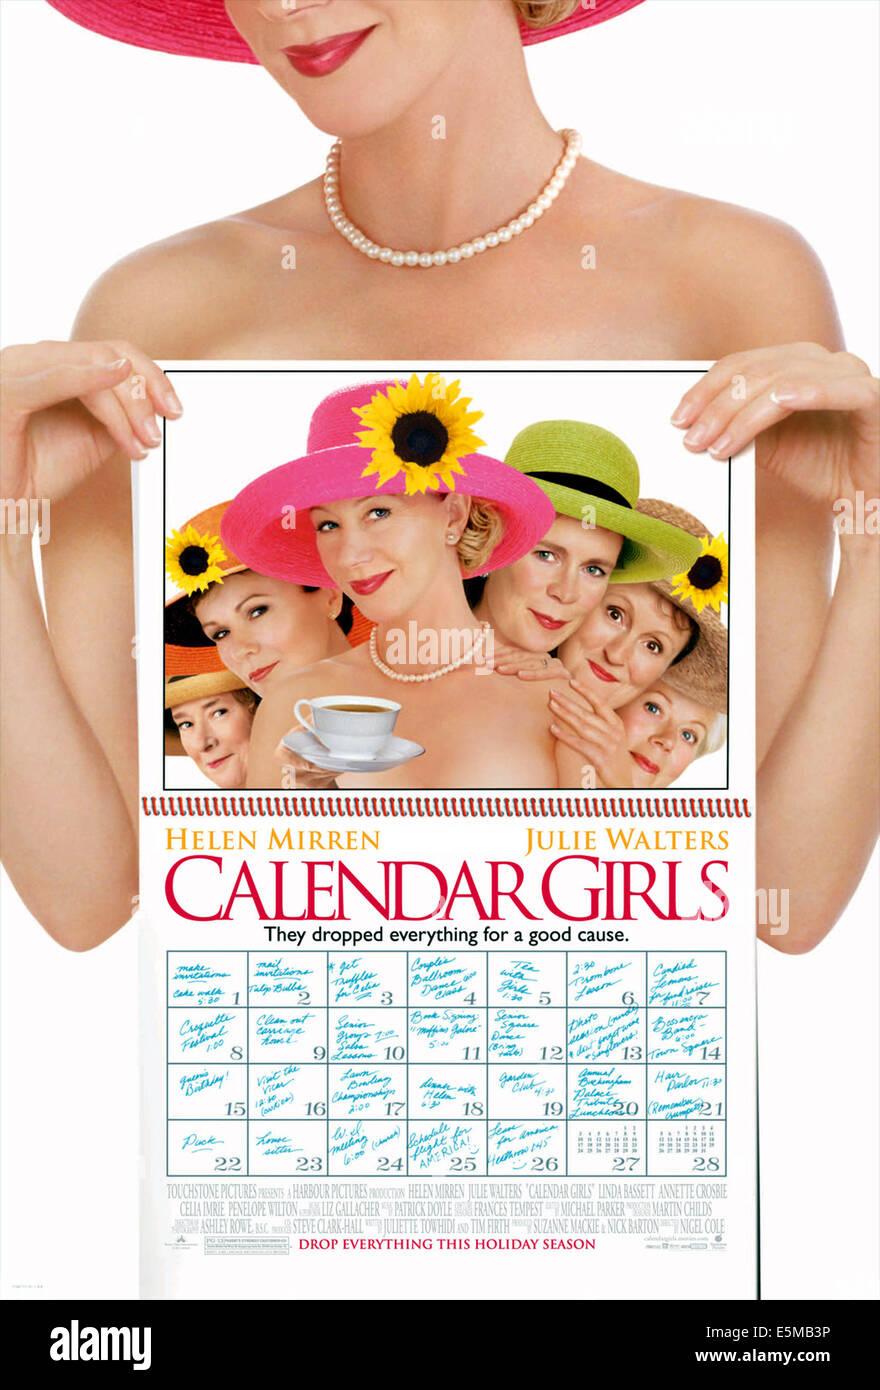 CALENDAR GIRLS, 2003, (c) Touchstone/courtesy Everett Collection - Stock Image